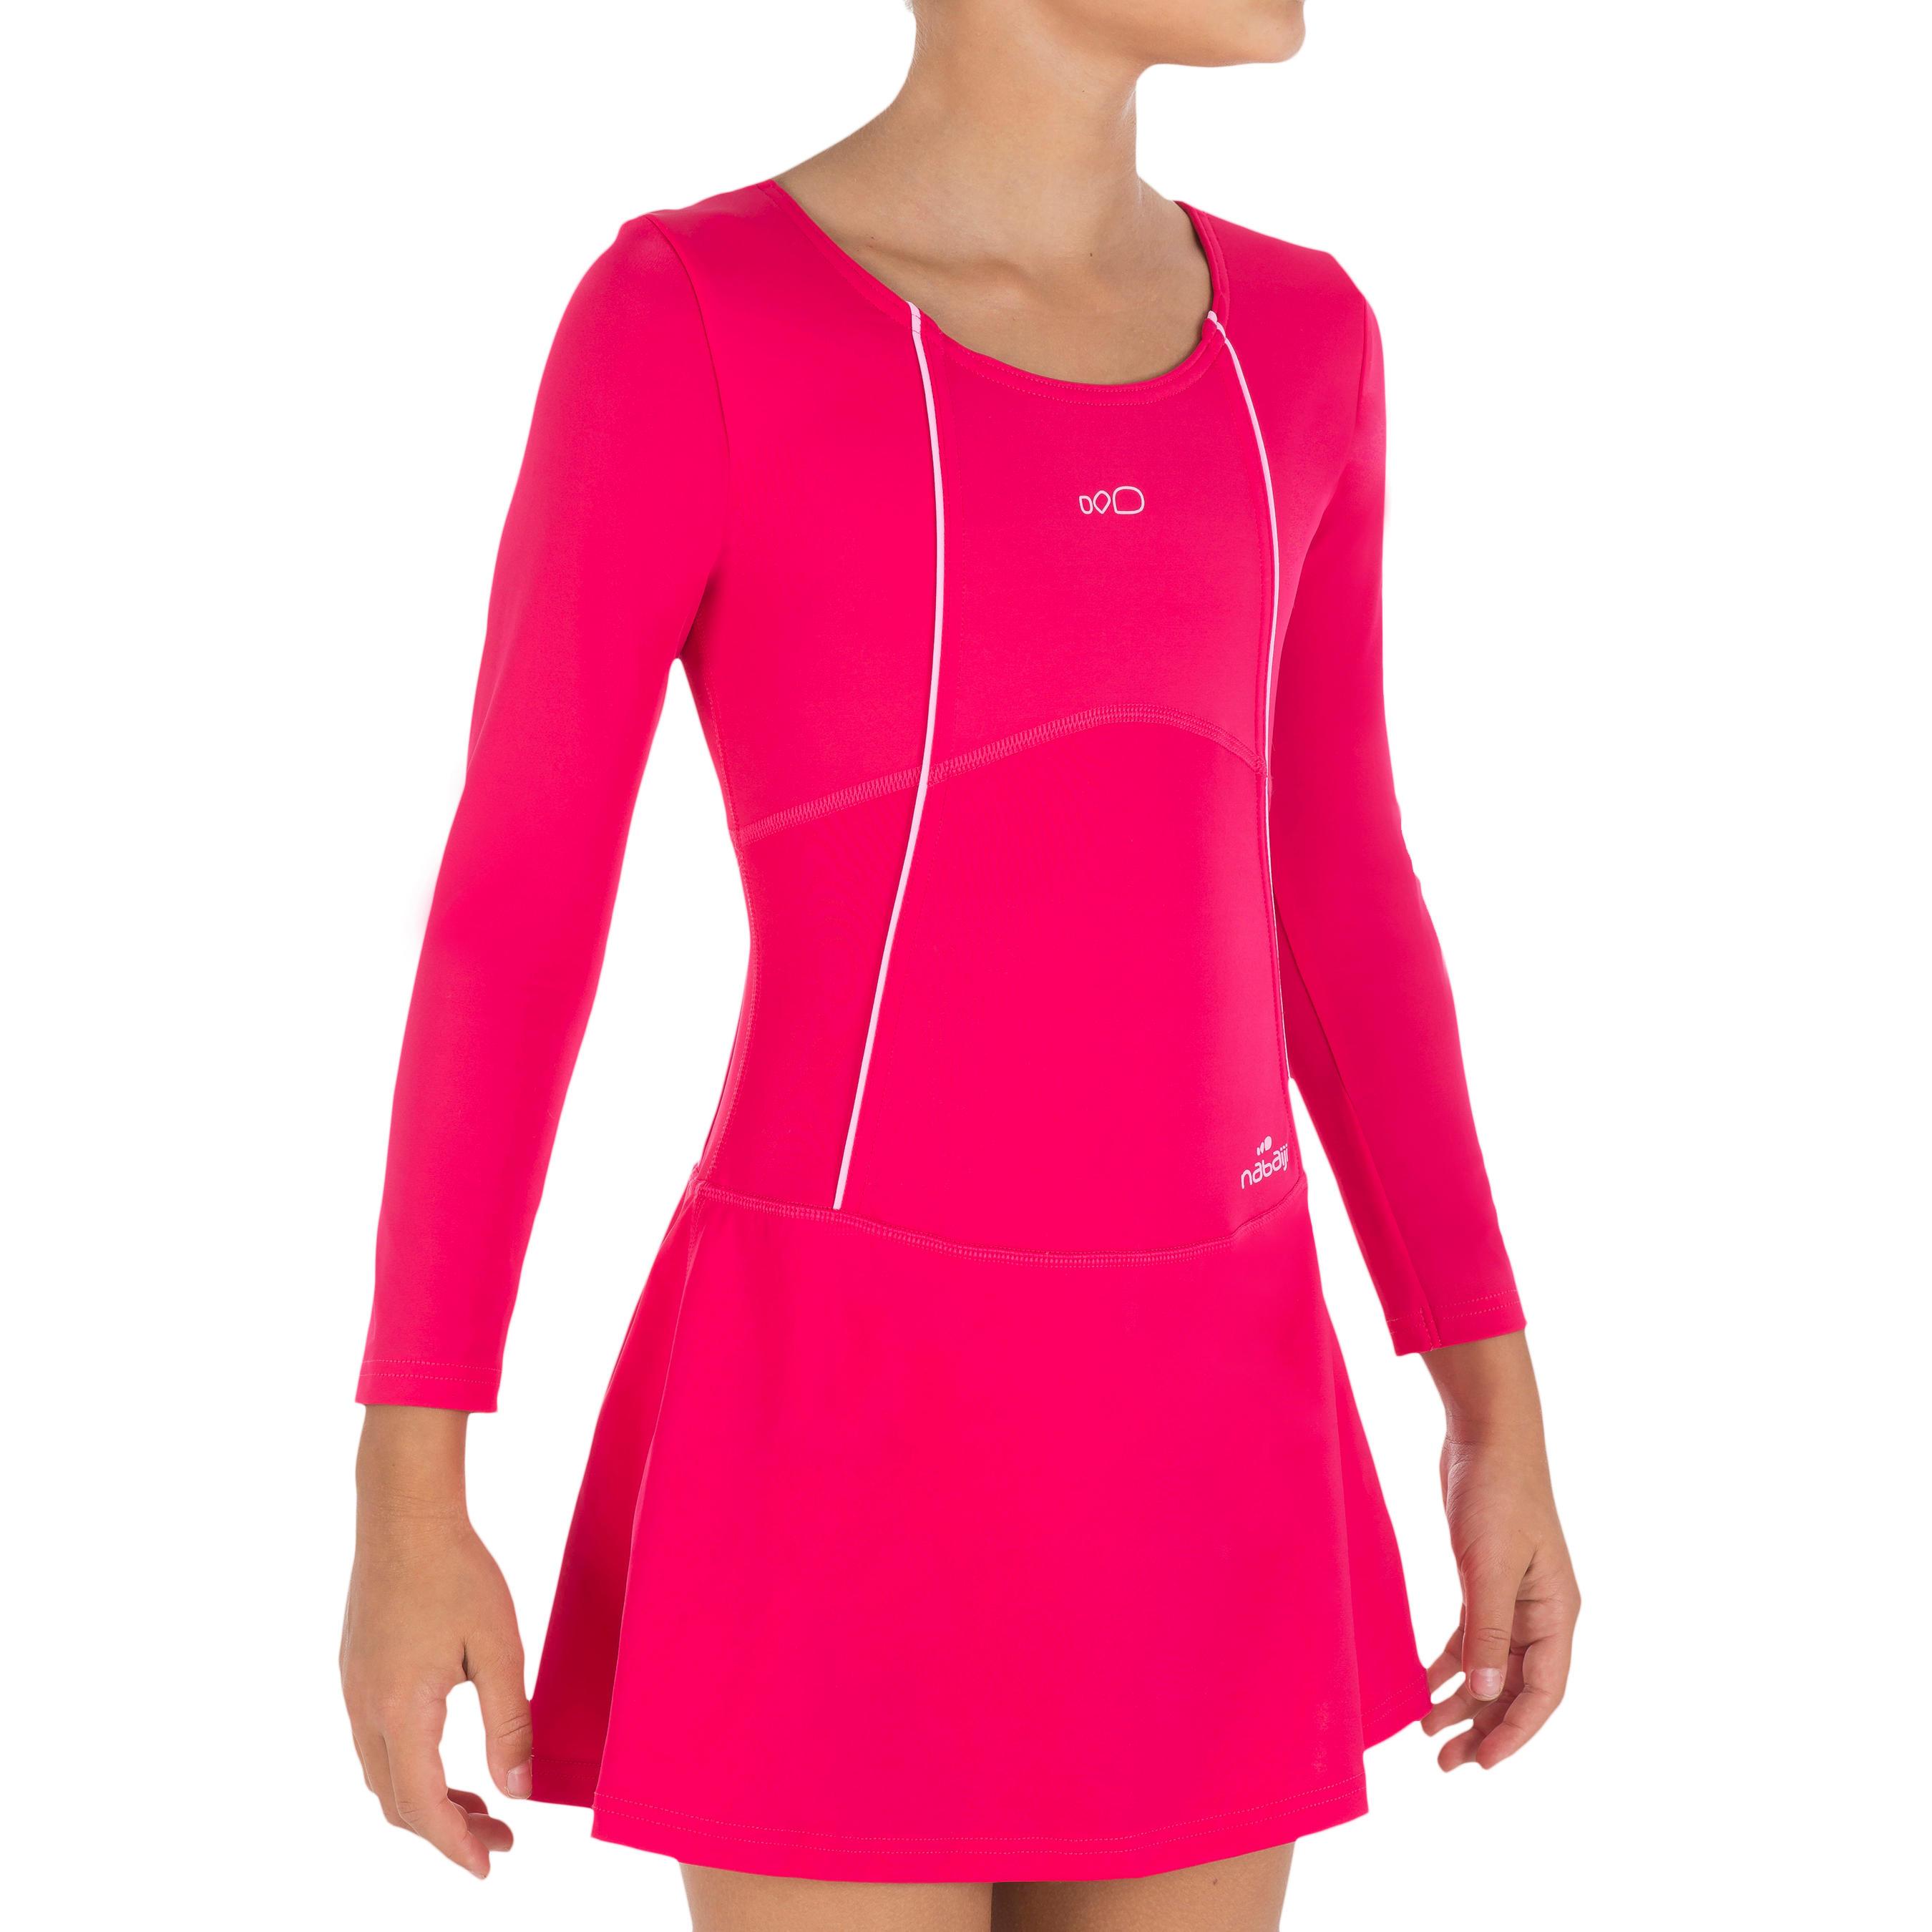 Audrey Sleeve girls' swimsuit - pink